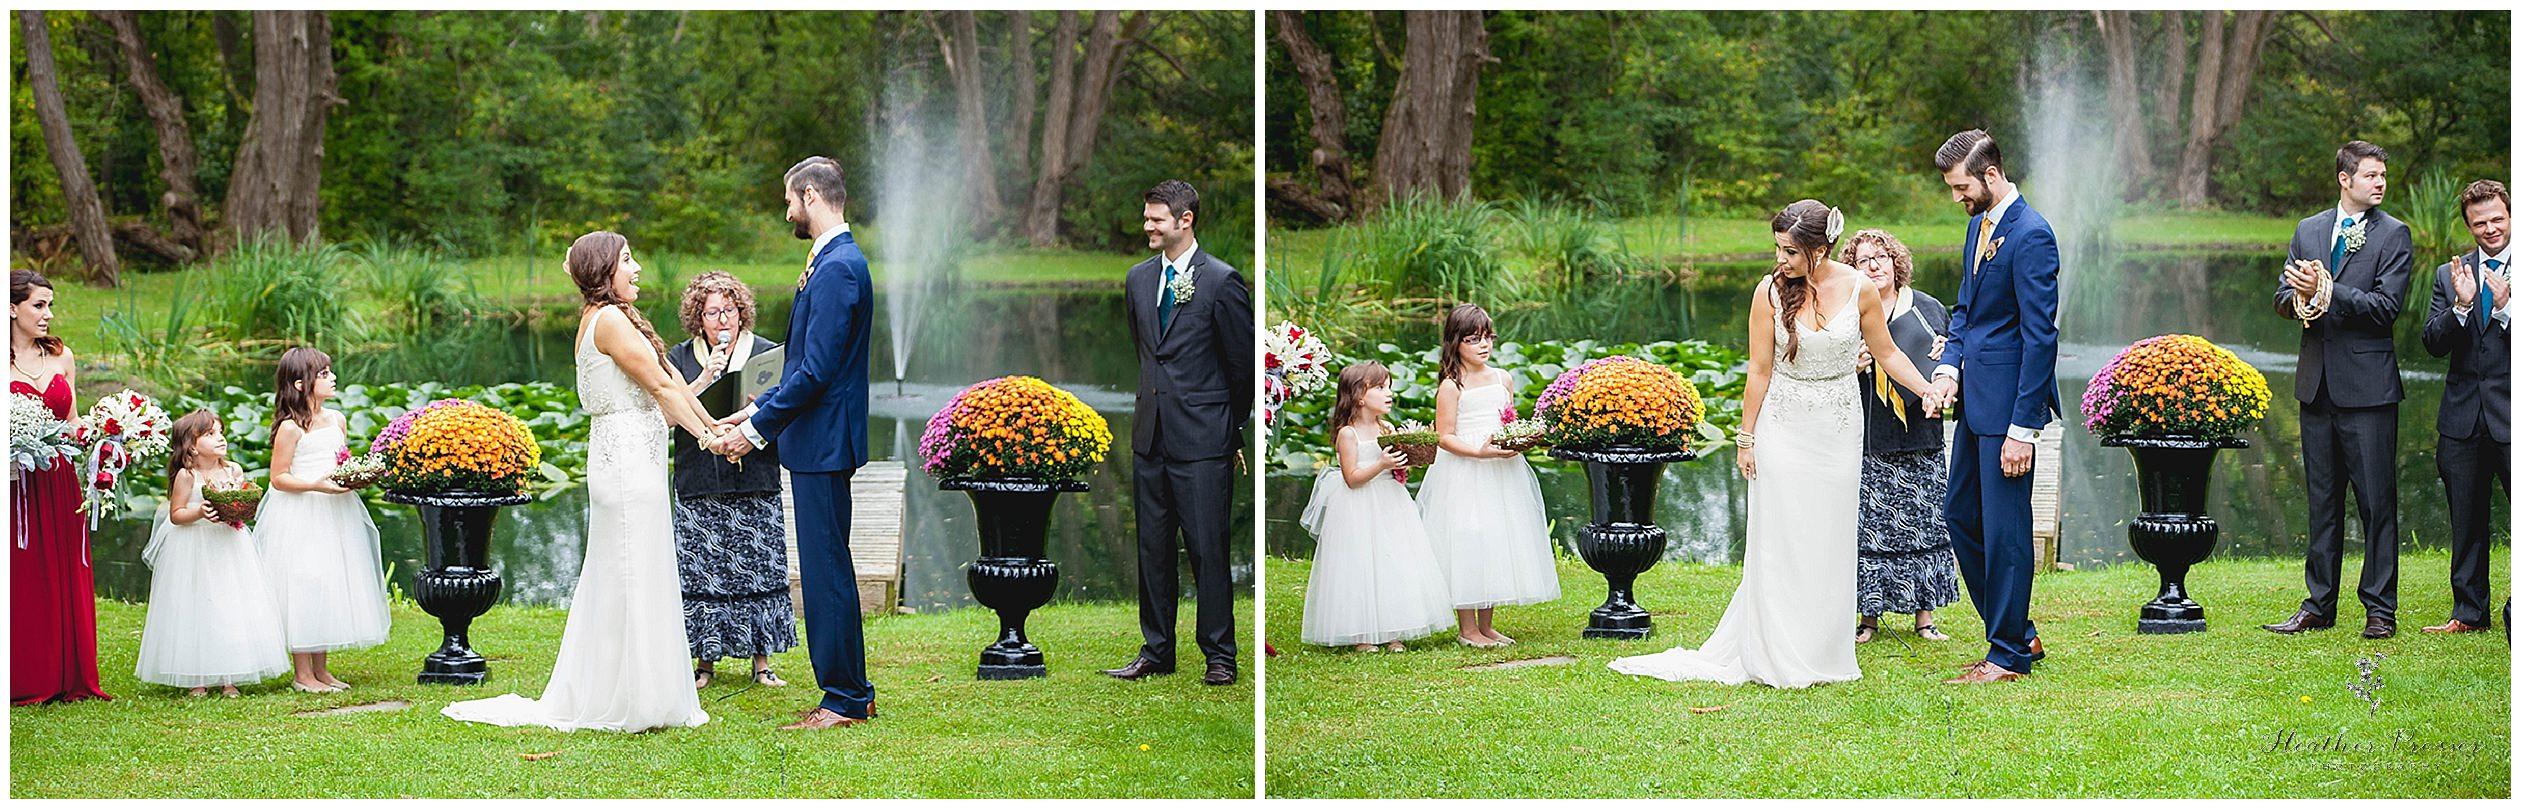 Bowmanville Wedding Photography_0203.jpg